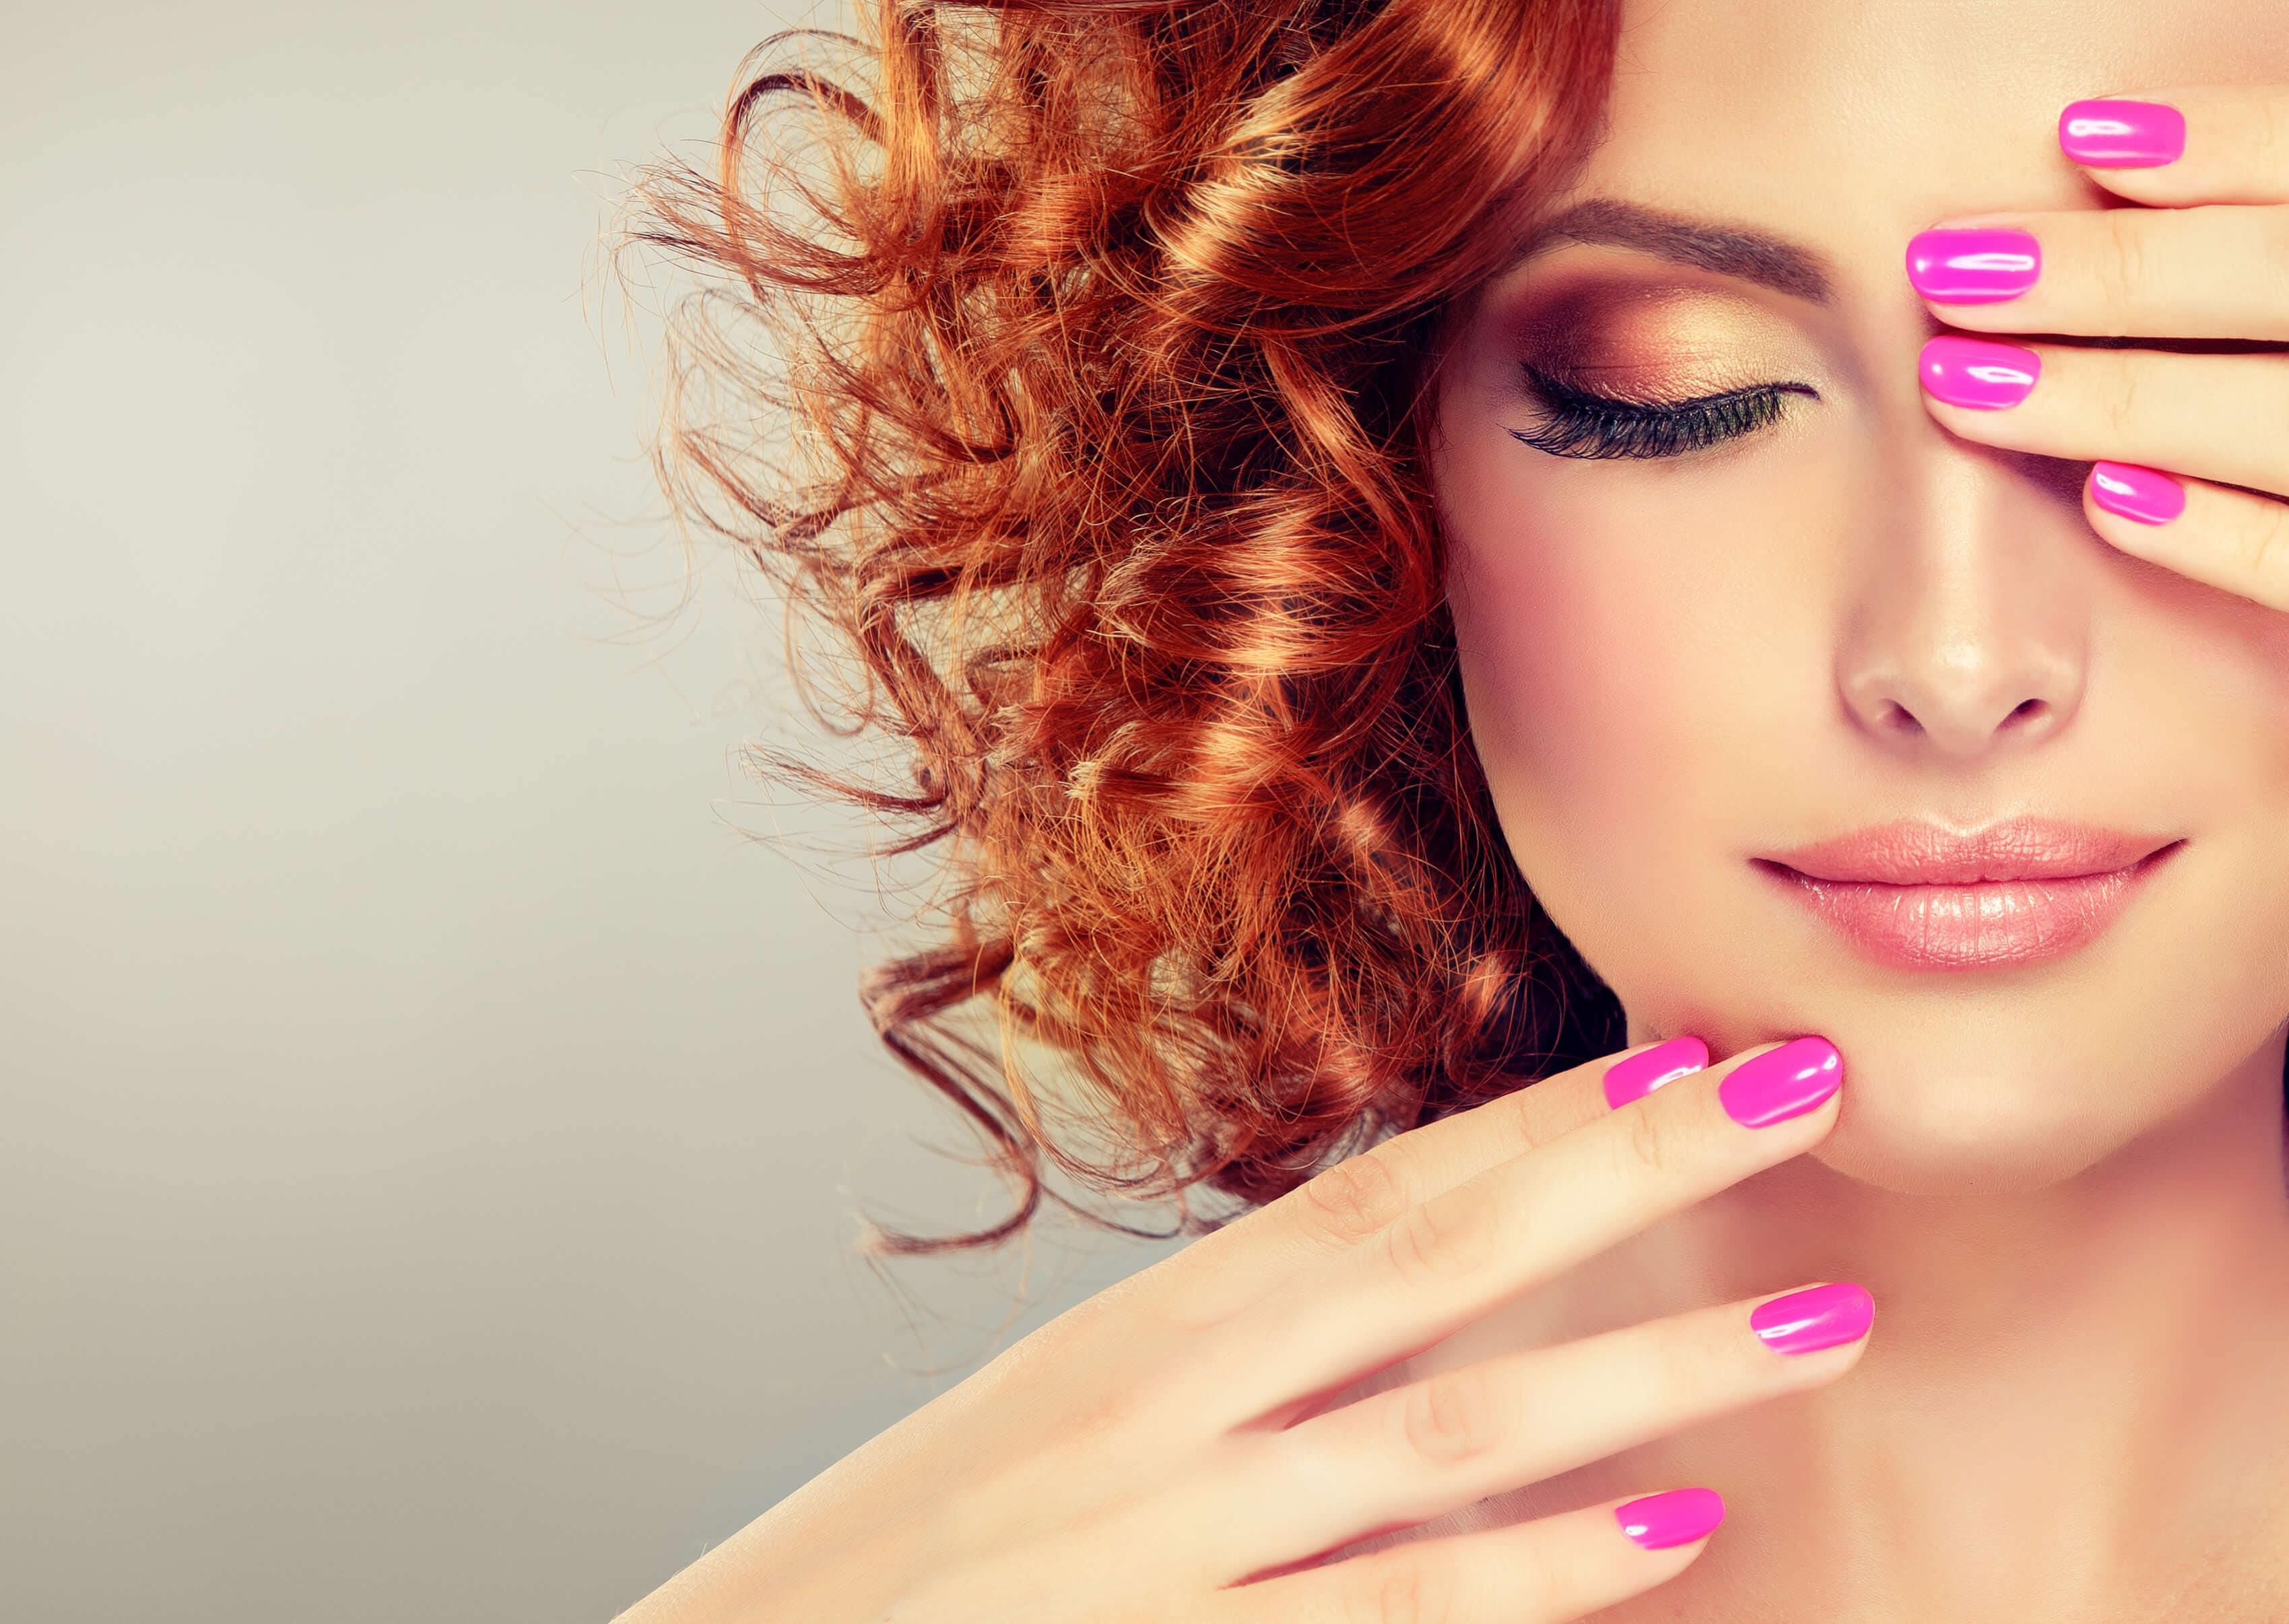 cabello rojo frambuesa con rizos